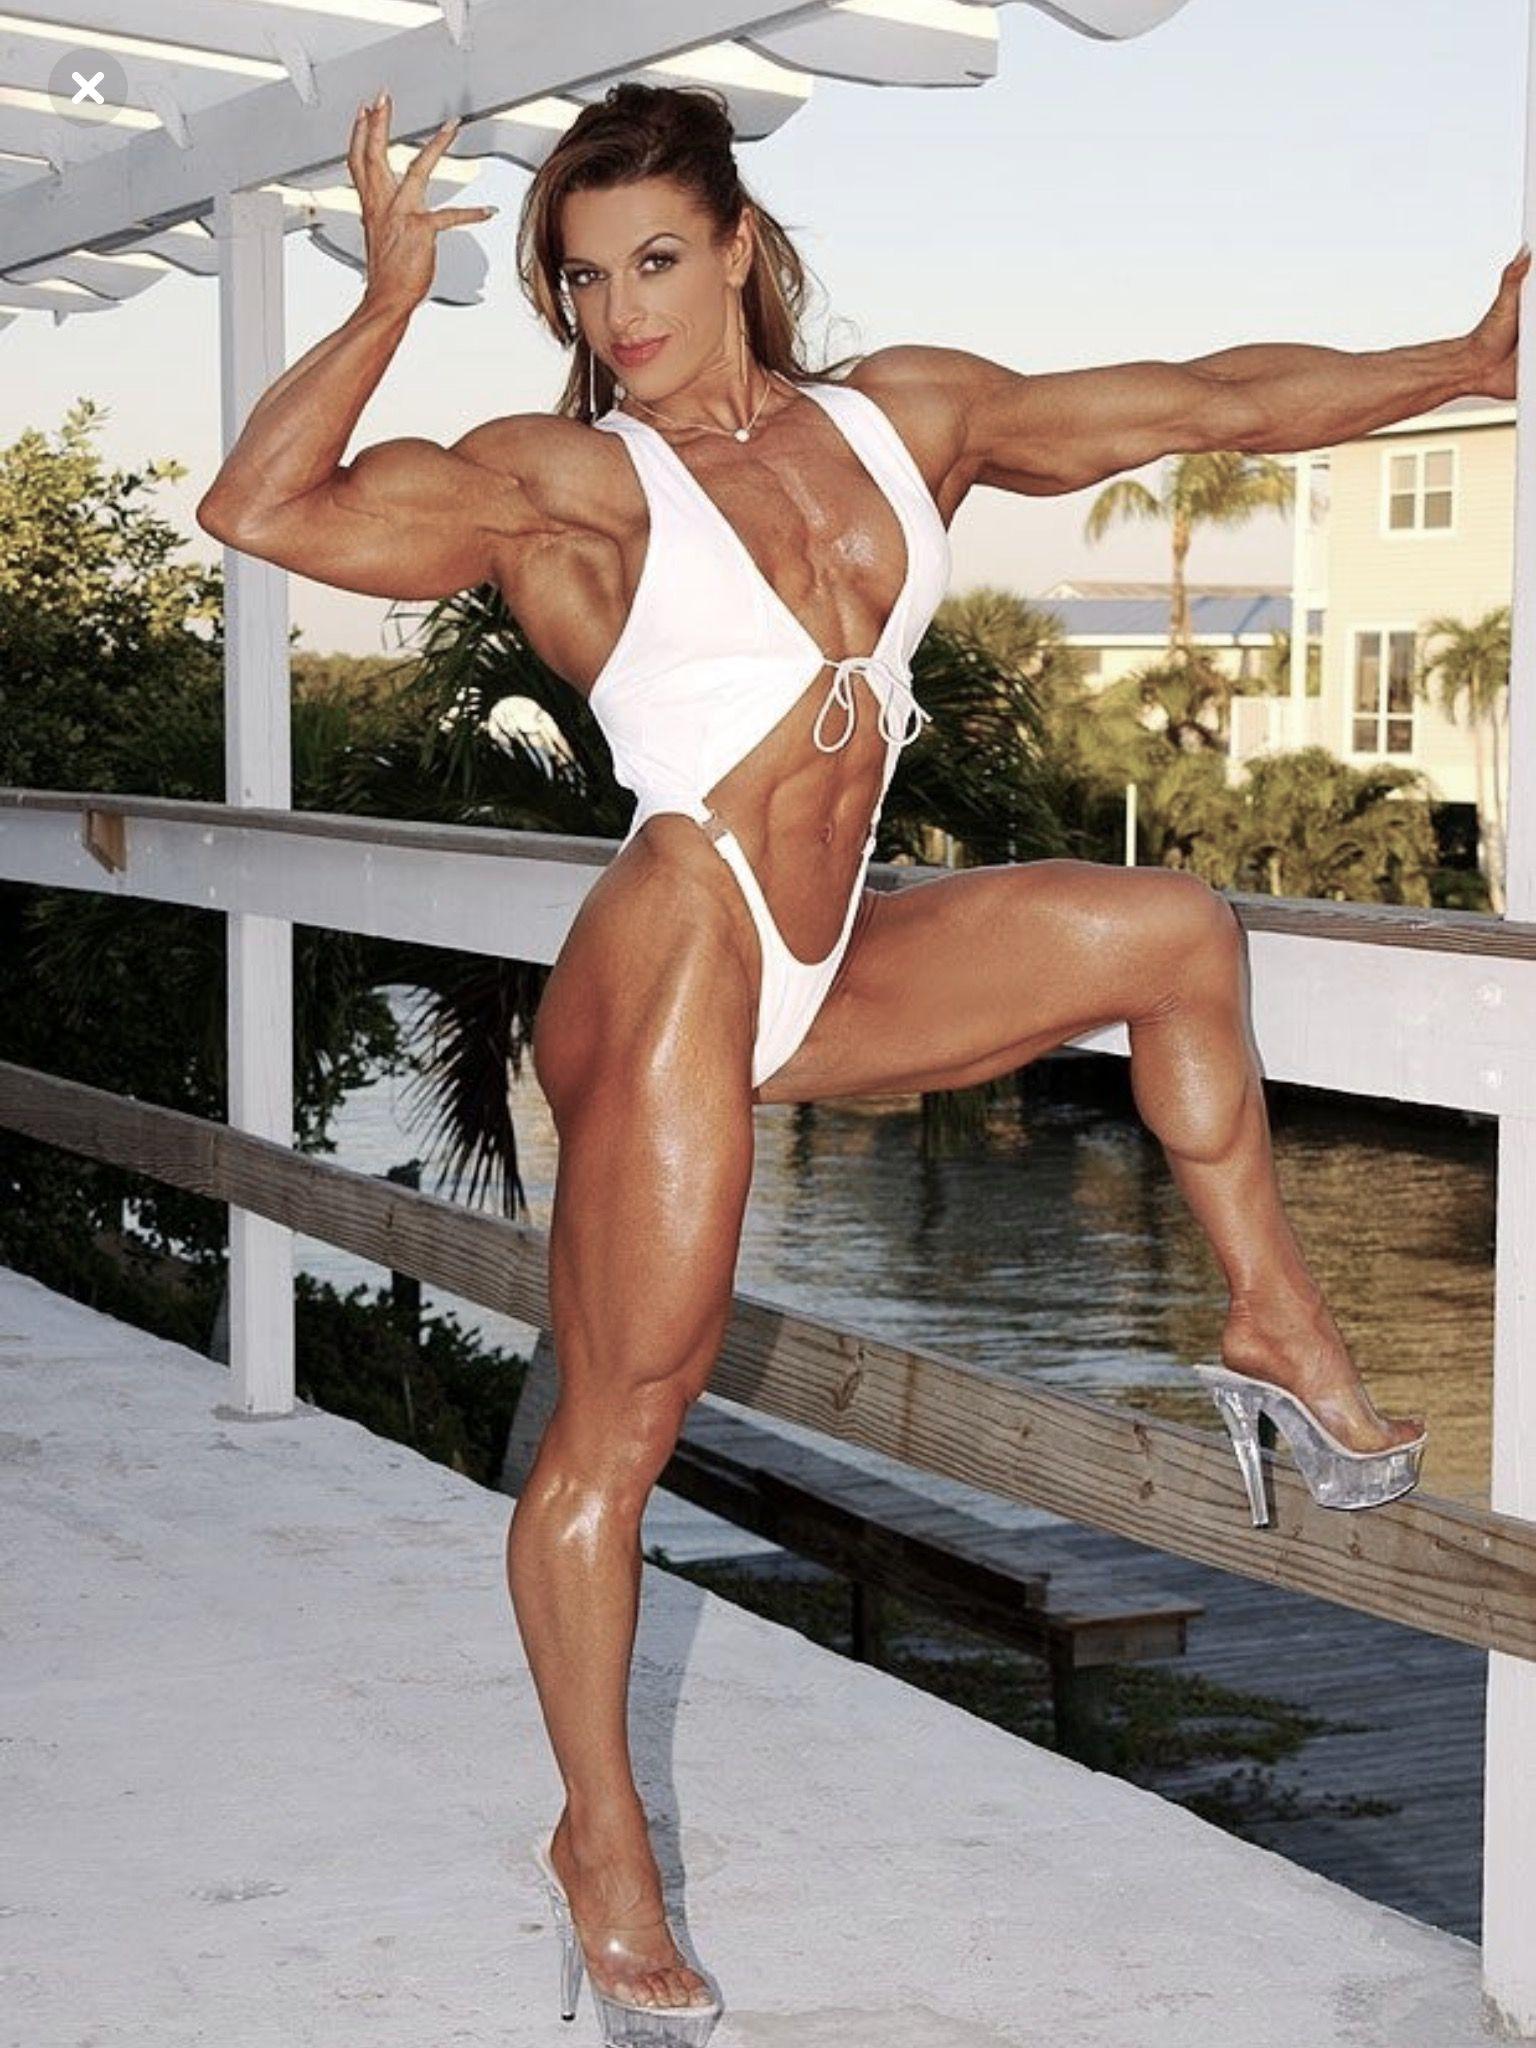 Bodybuilders hardcore women agree with